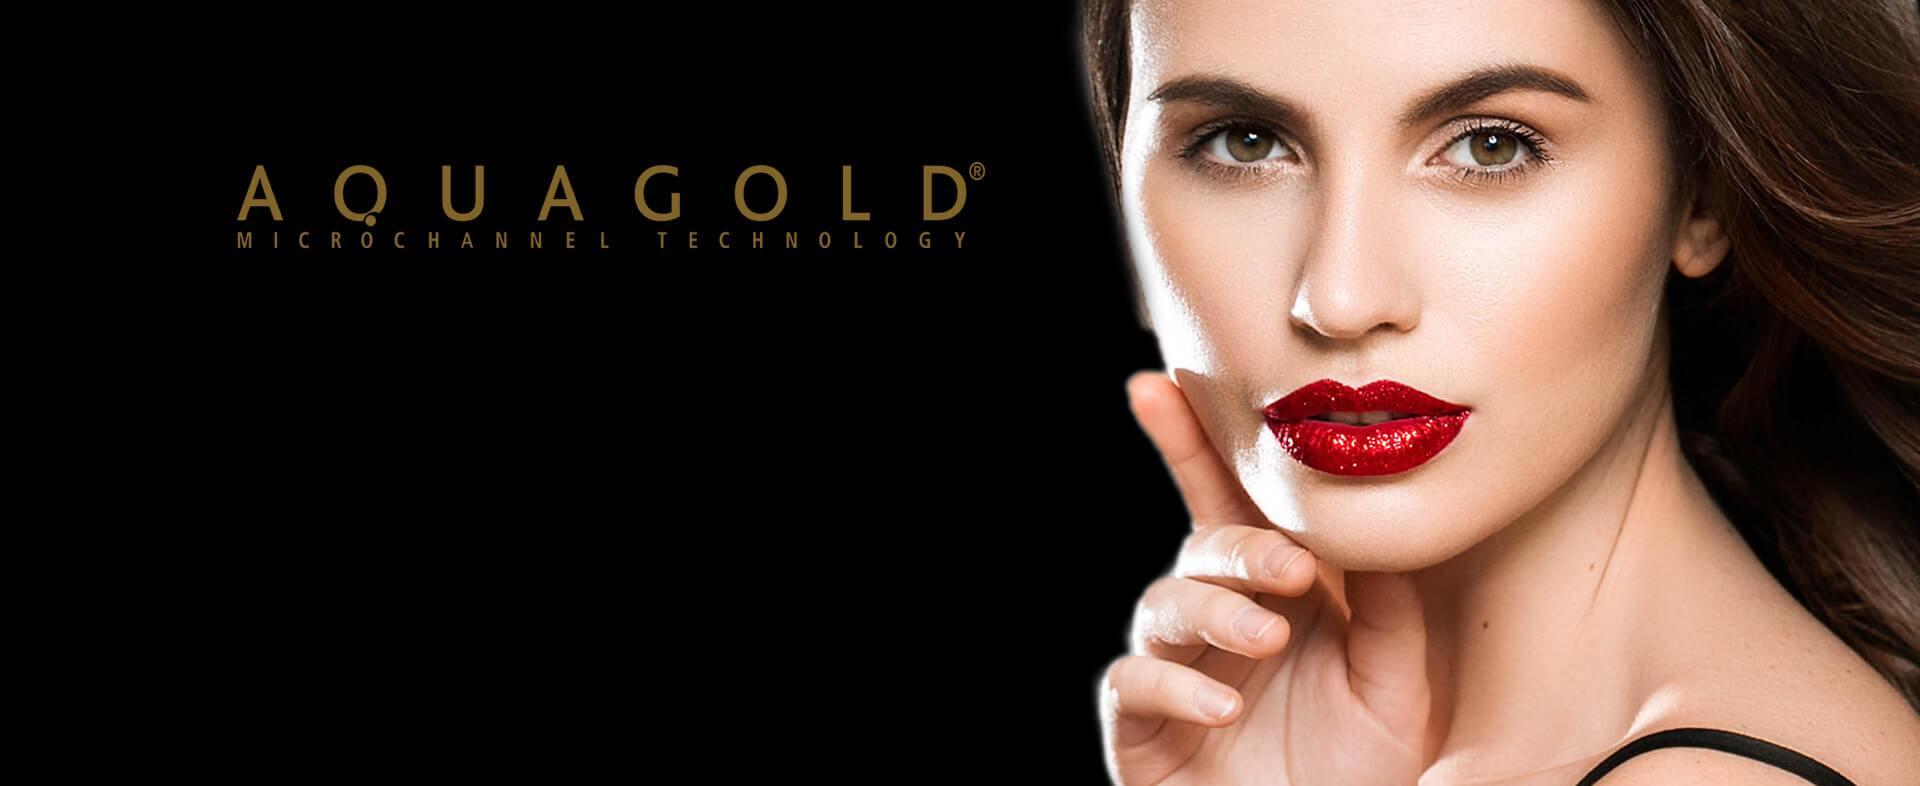 Aquagold Monthly Specials